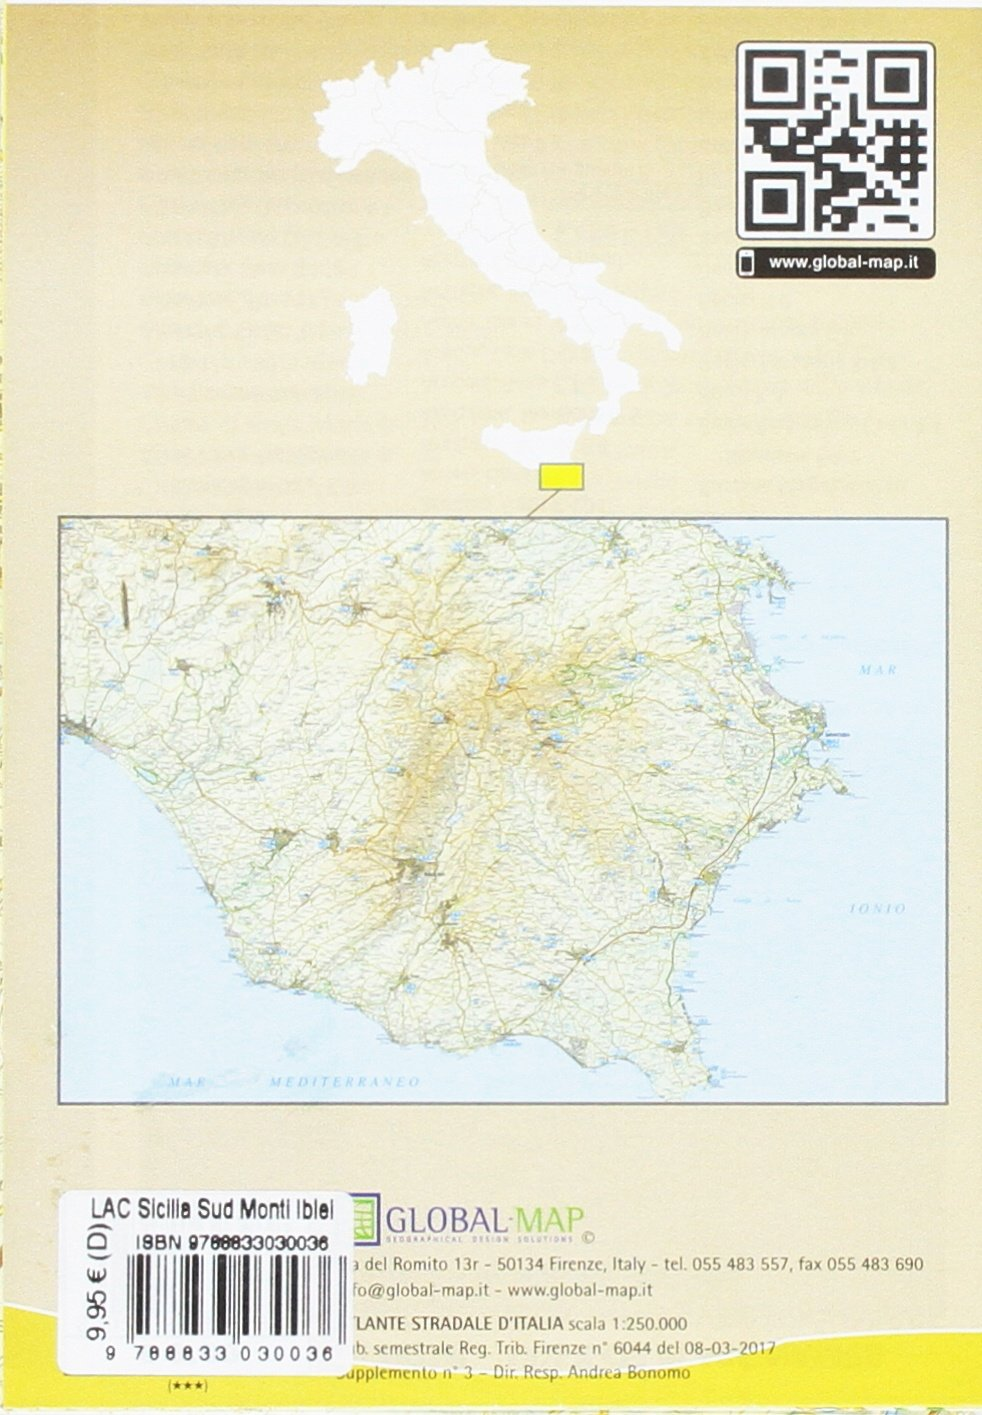 Cartina Geografica Sicilia Sud Orientale.Amazon It Sicilia Sud Orientale Carta Turistico Stradale 1 120 000 Cm 97x67 Global Map Libri